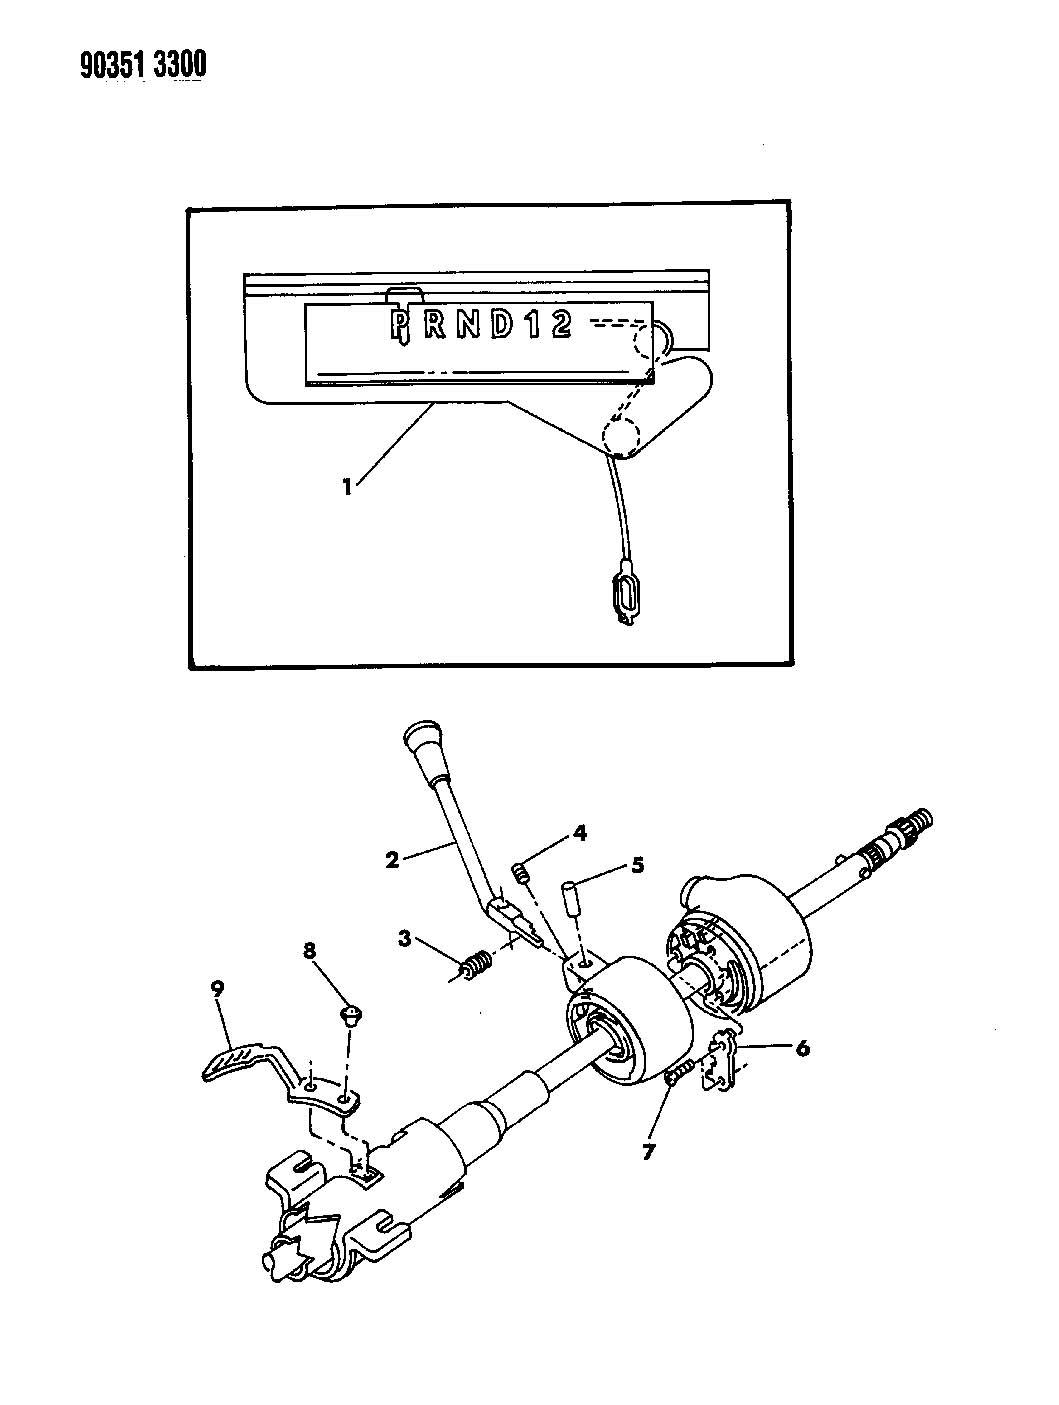 Dodge Dakota Indicator  G  Shift  Shift Indicator Assembly  Gearshift  Up To 3-1-90